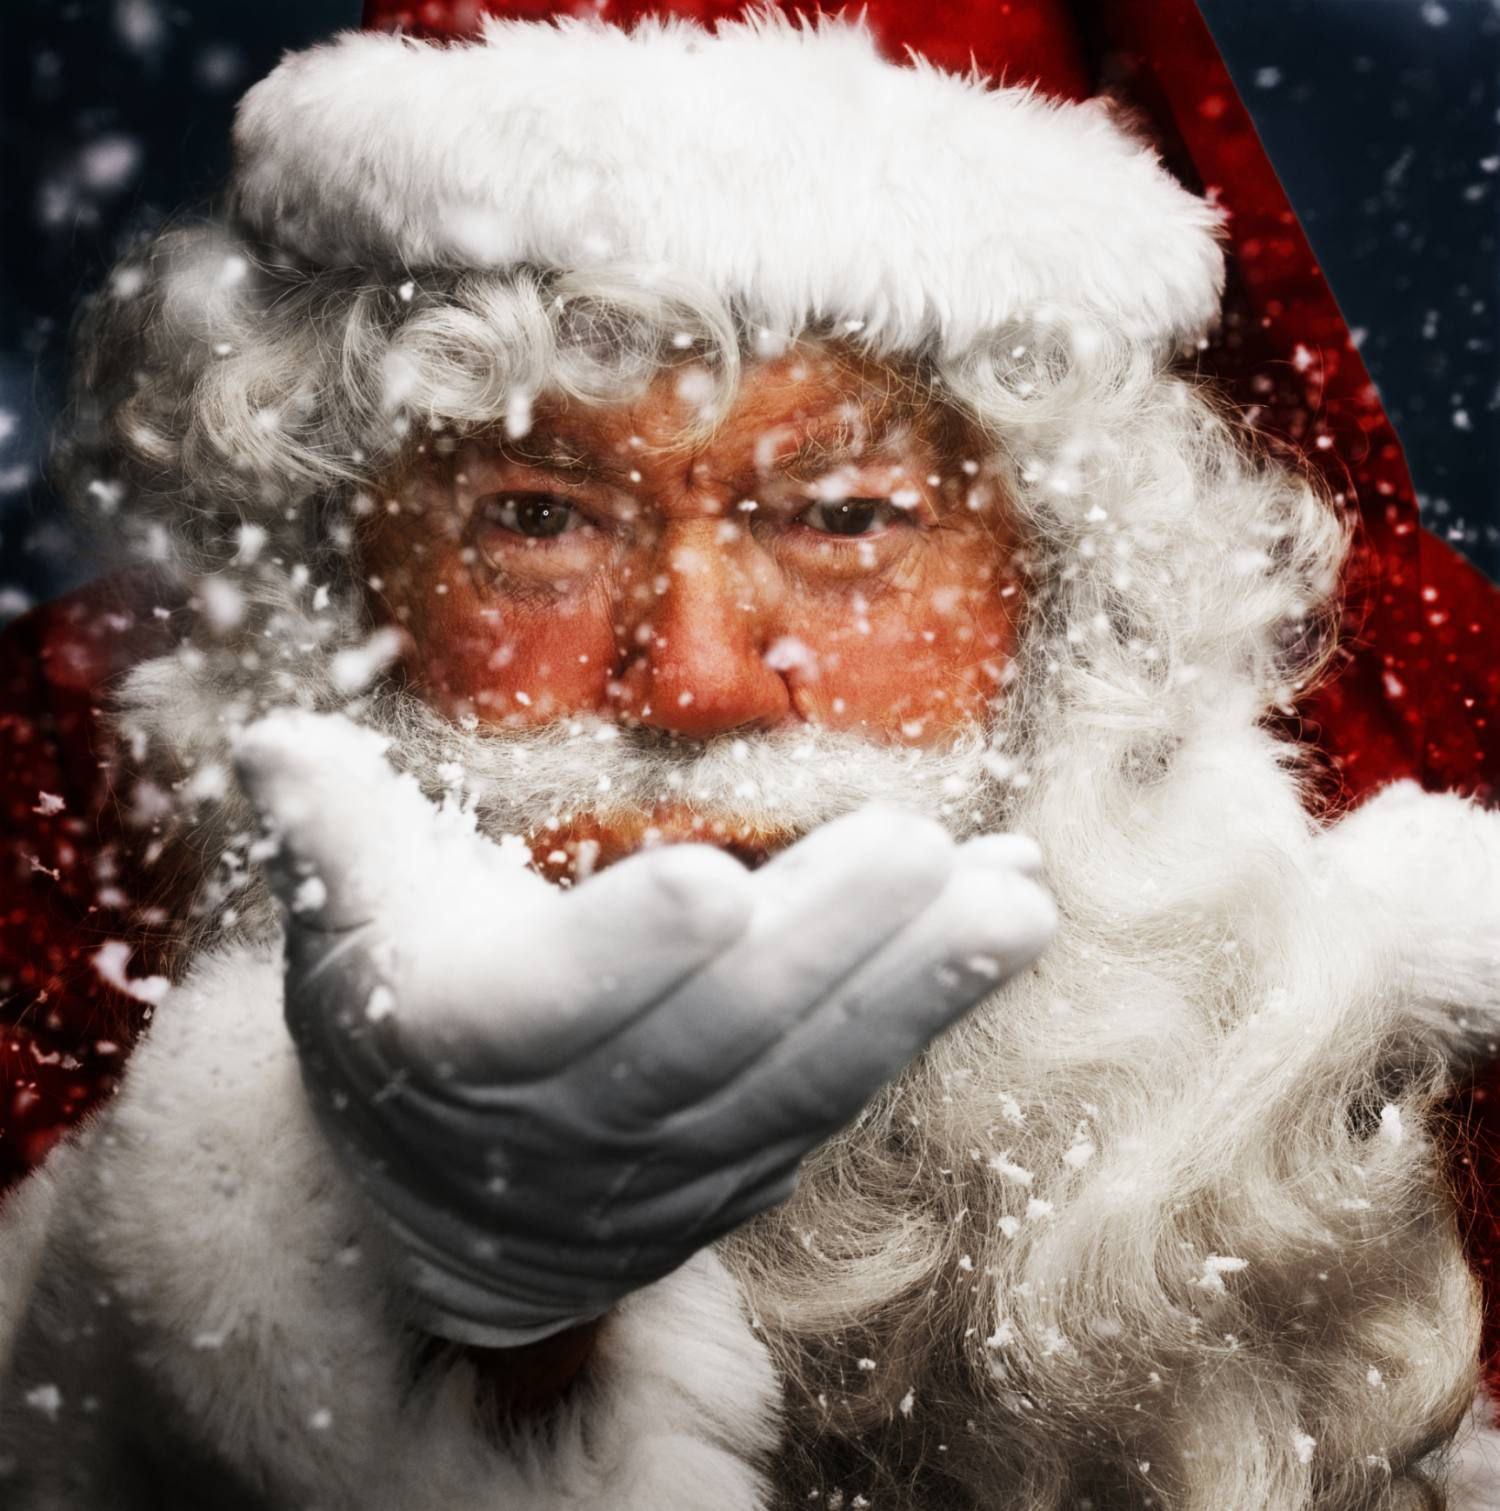 bring the spirit of santa alive for kids on christmas